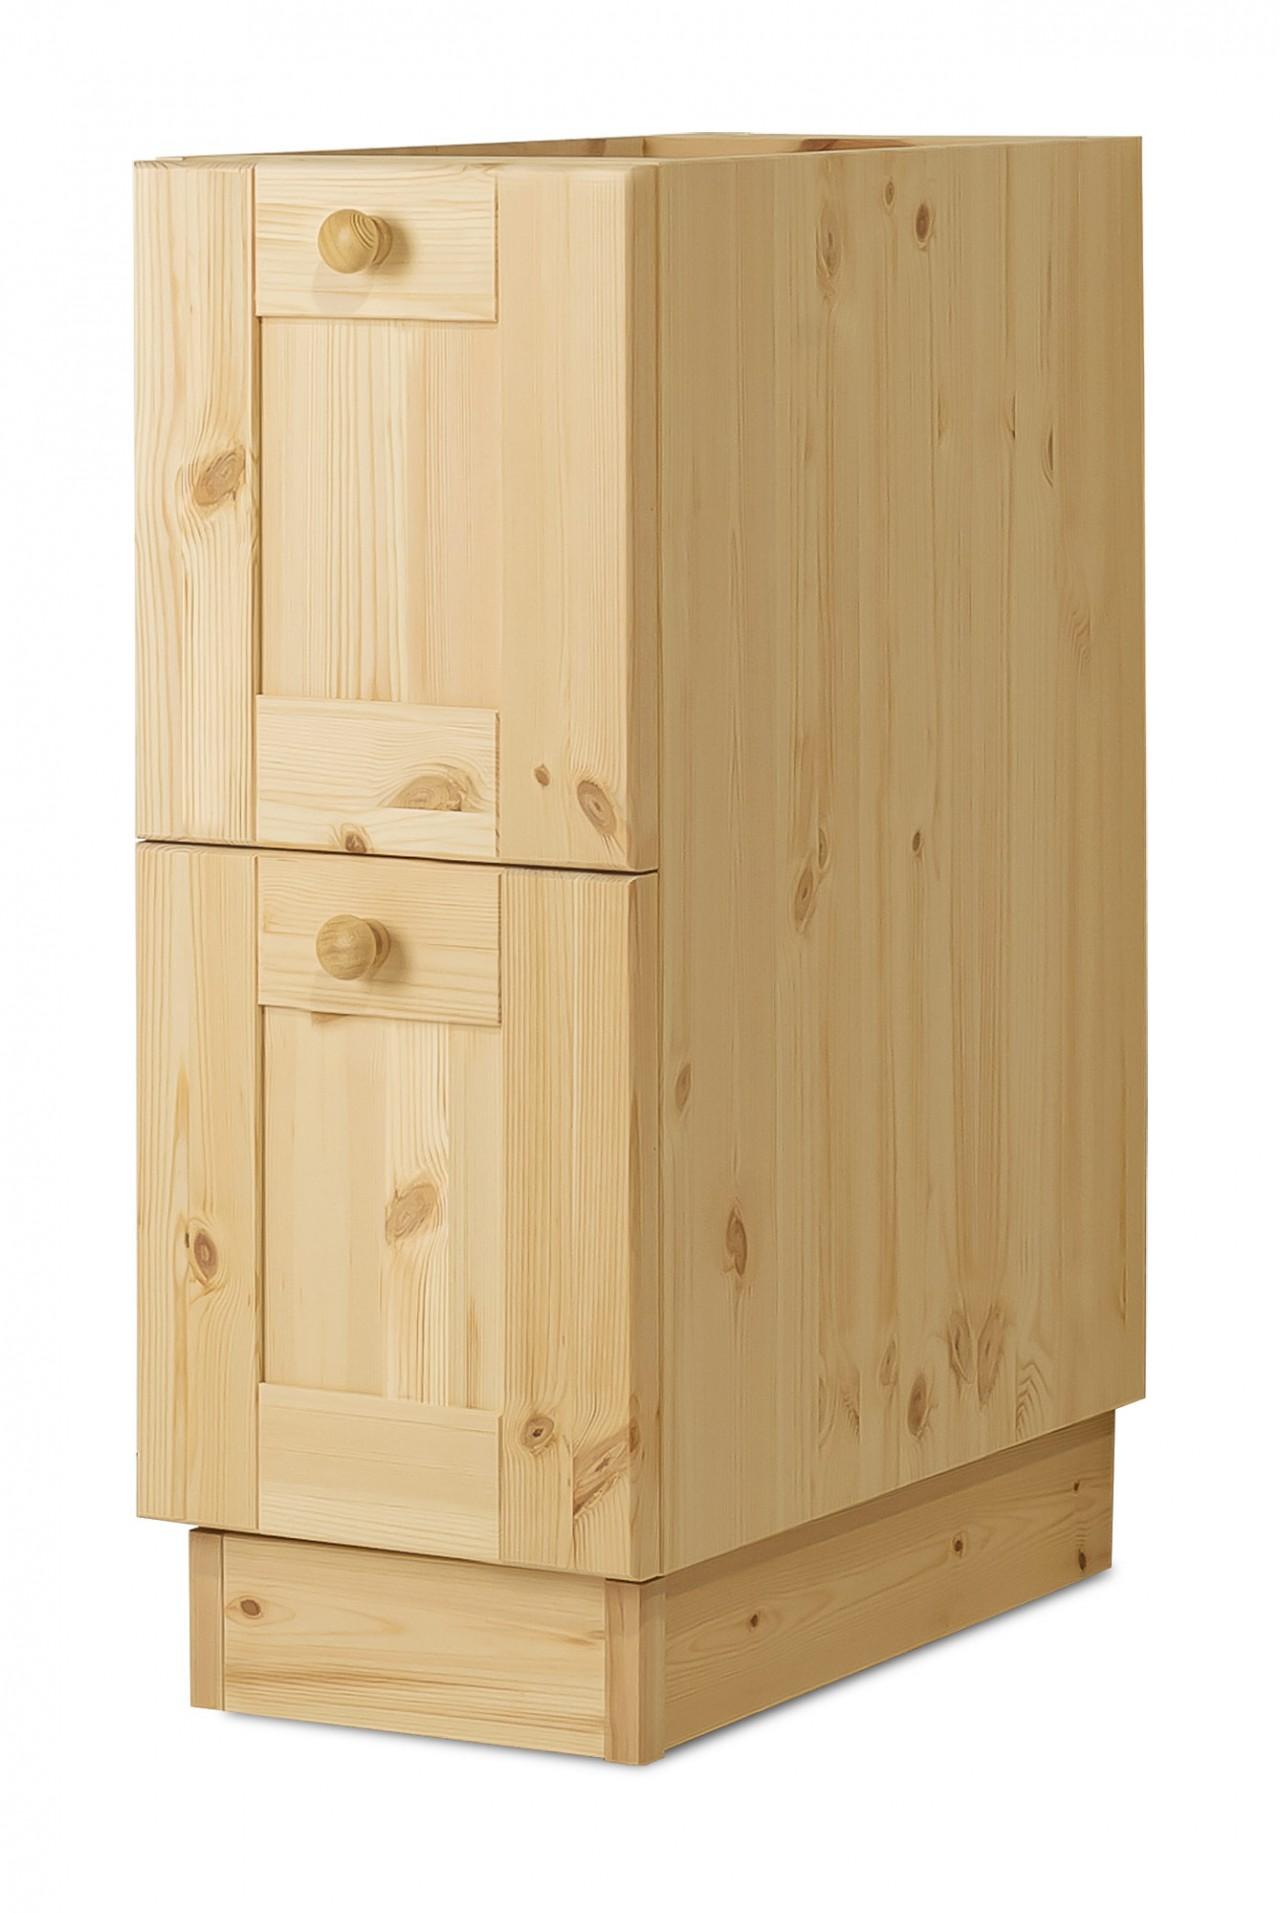 Base cucina anta treviso base cassettiera da 30 2c - Cassettiera da cucina ...